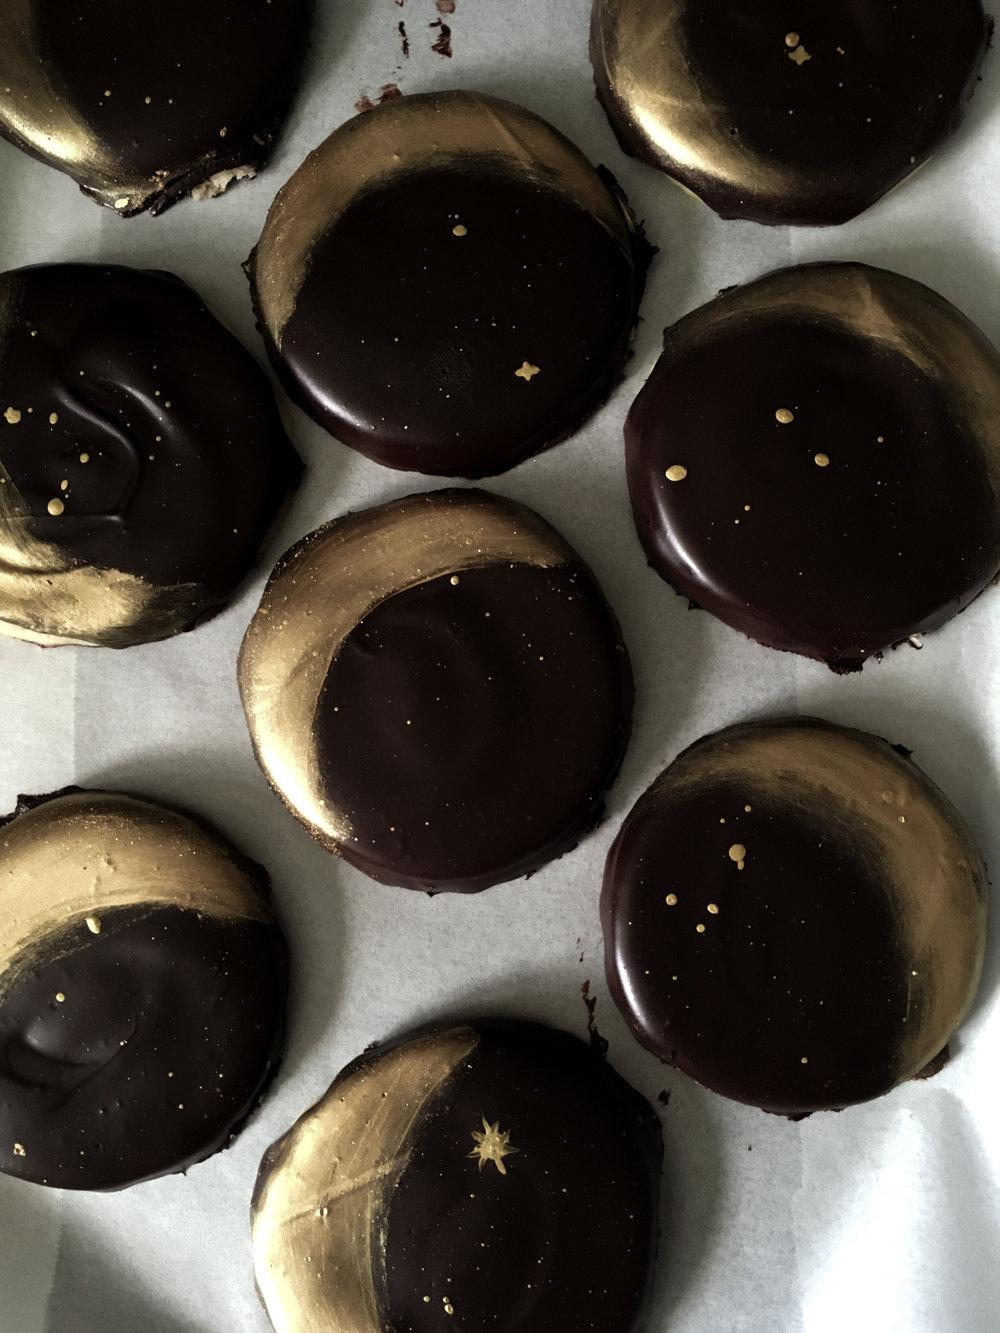 gold moons on dark chocolate